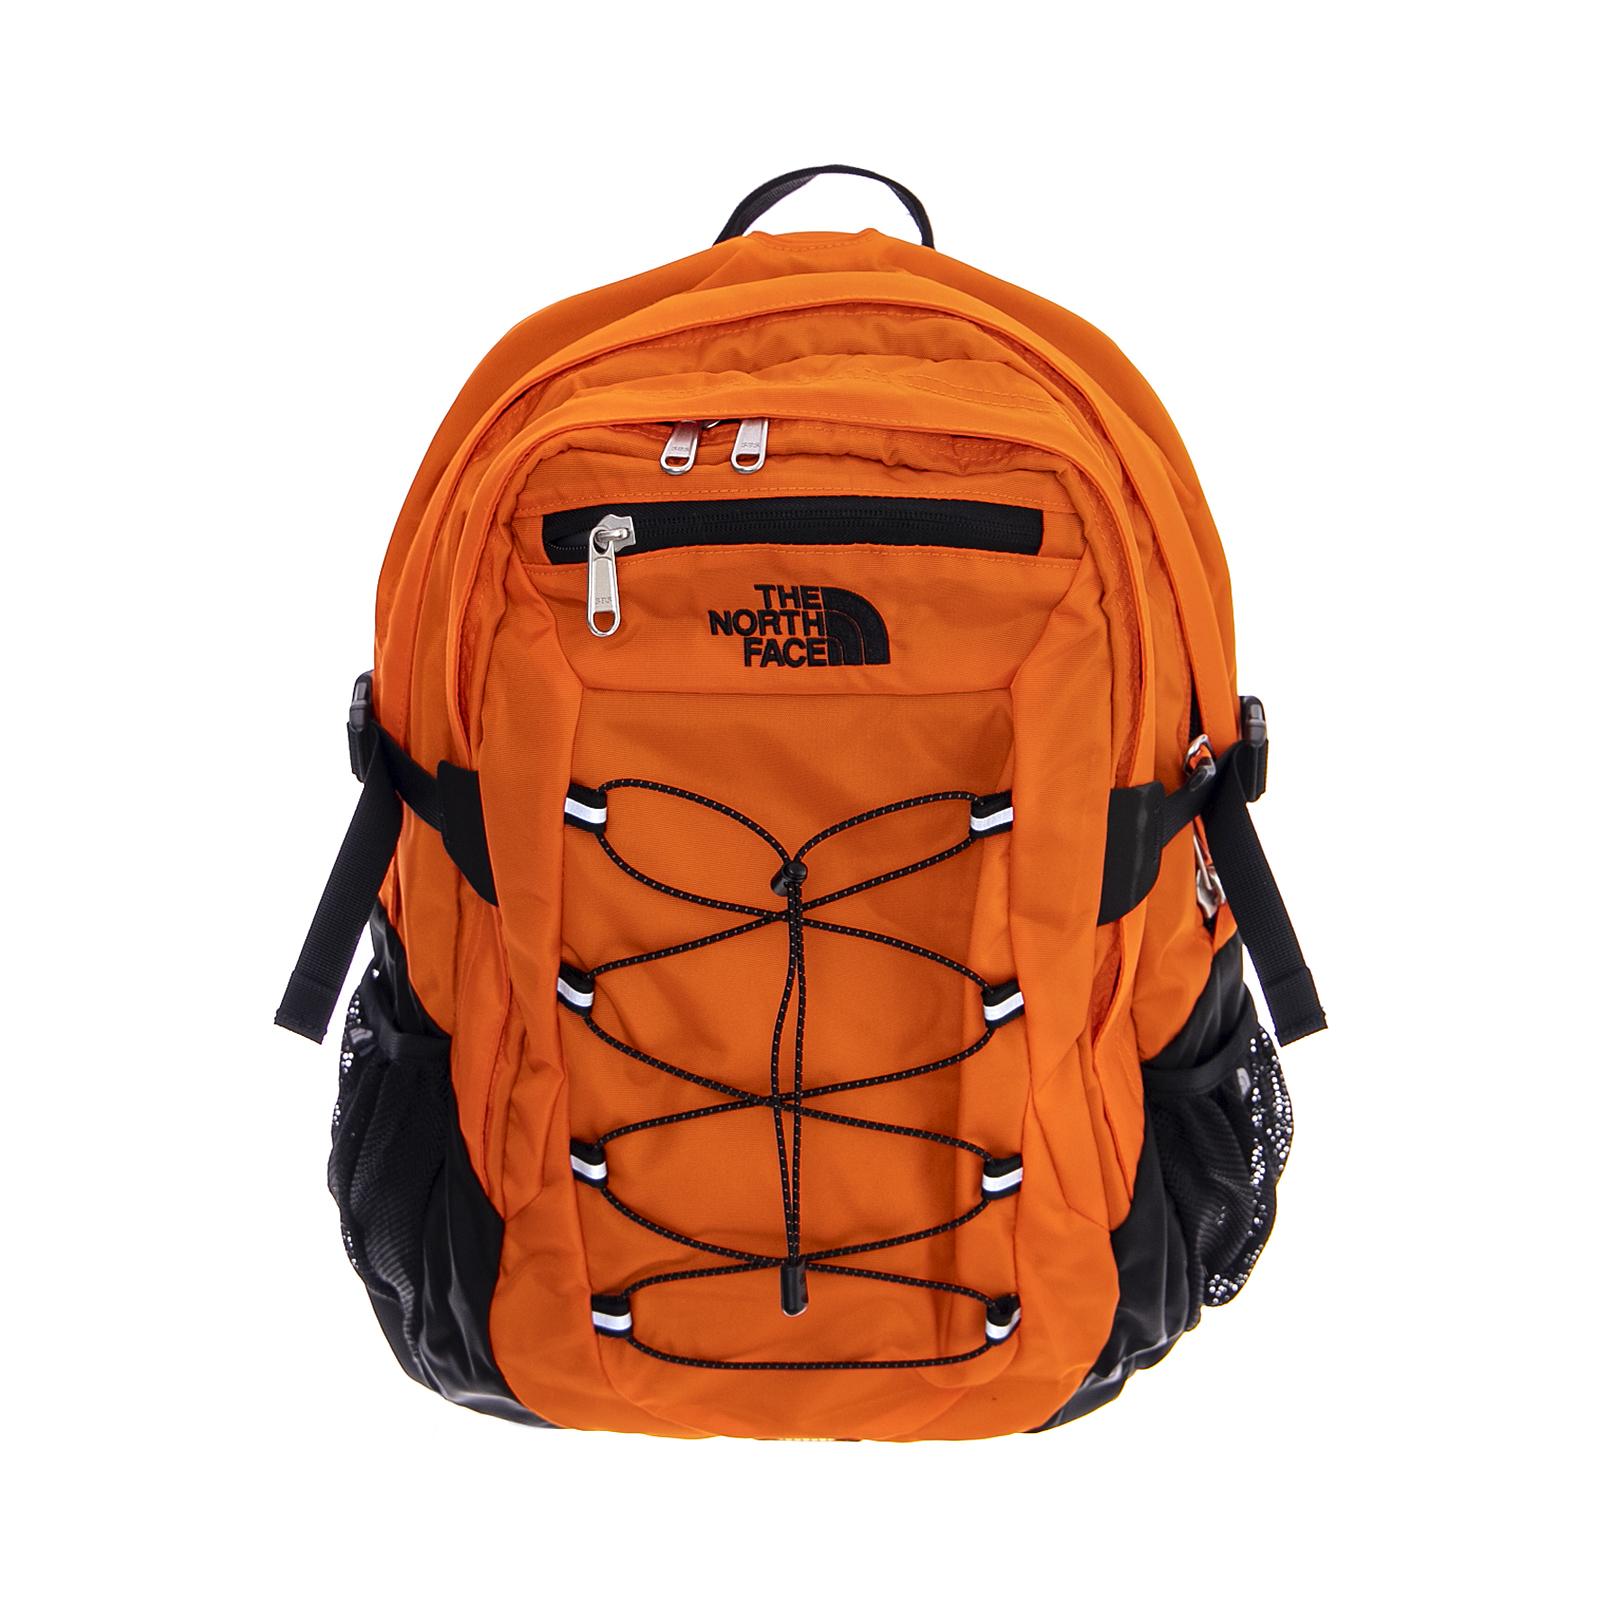 The North Face Sacs à dos Borealis Classique Persianorg Tnfb Orange ... d17064bac806